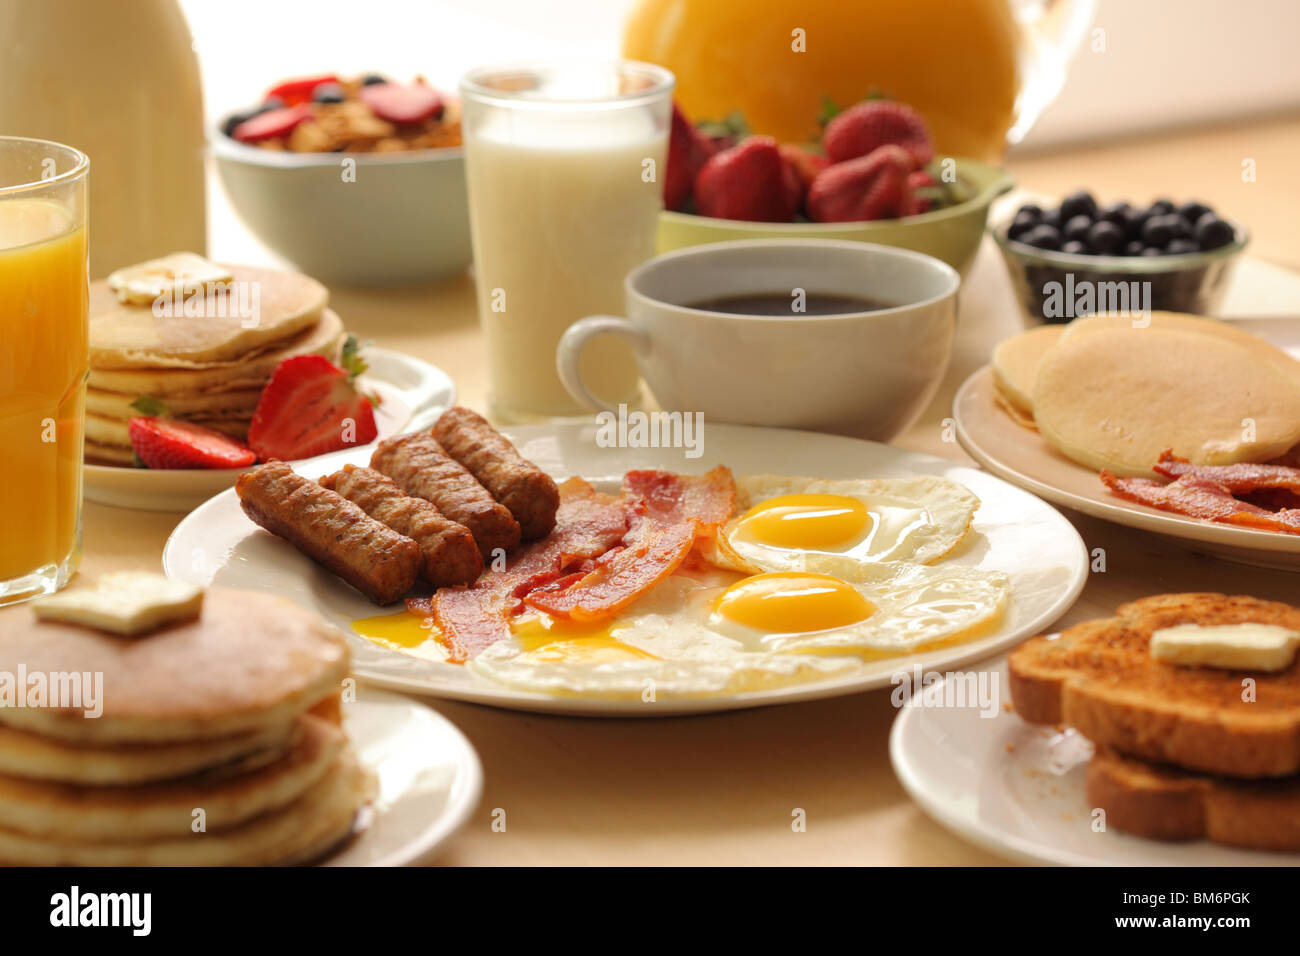 Frühstück, Wurst, Speck, Eiern, Toast, Kaffee, Müsli, Obst, Toast und Pfannkuchen Stockbild